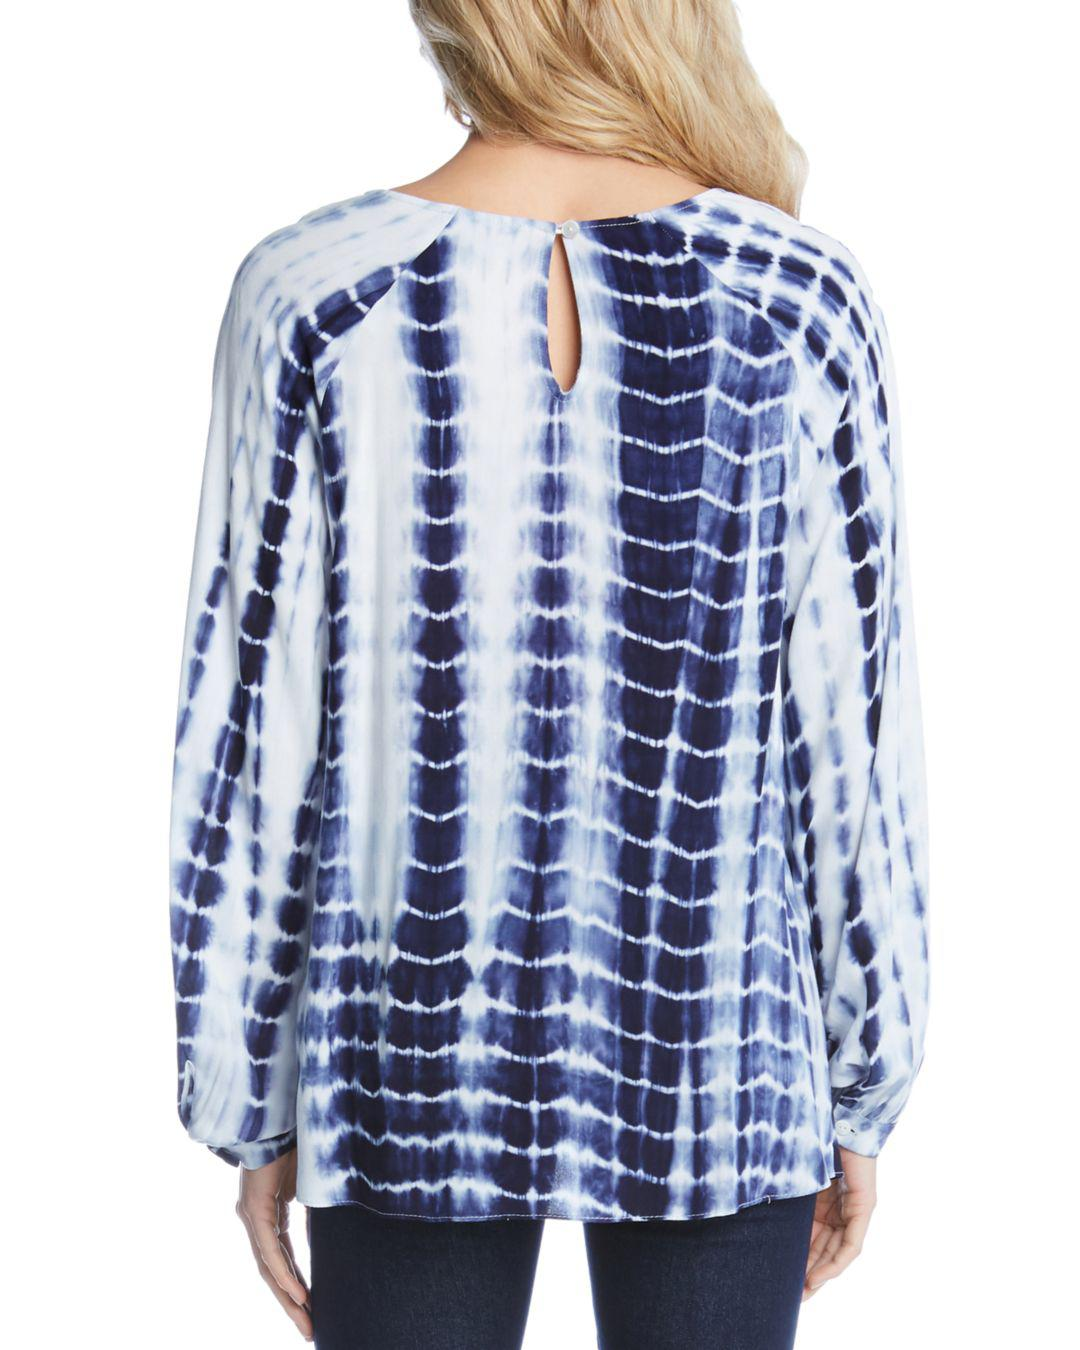 078bfa18d4c32 Lyst - Karen Kane Tie-dye Twist-hem Top in Blue